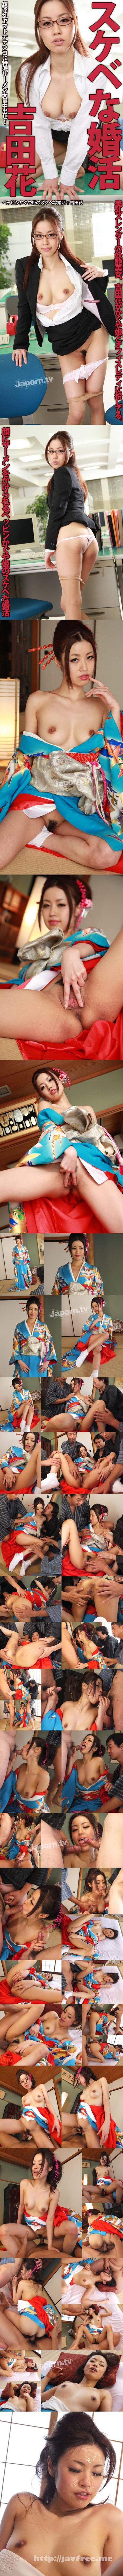 [HEY 023] ベッピンかぐや姫のスケベな婚活 : 吉田花 吉田花 HEY Hana Yoshida